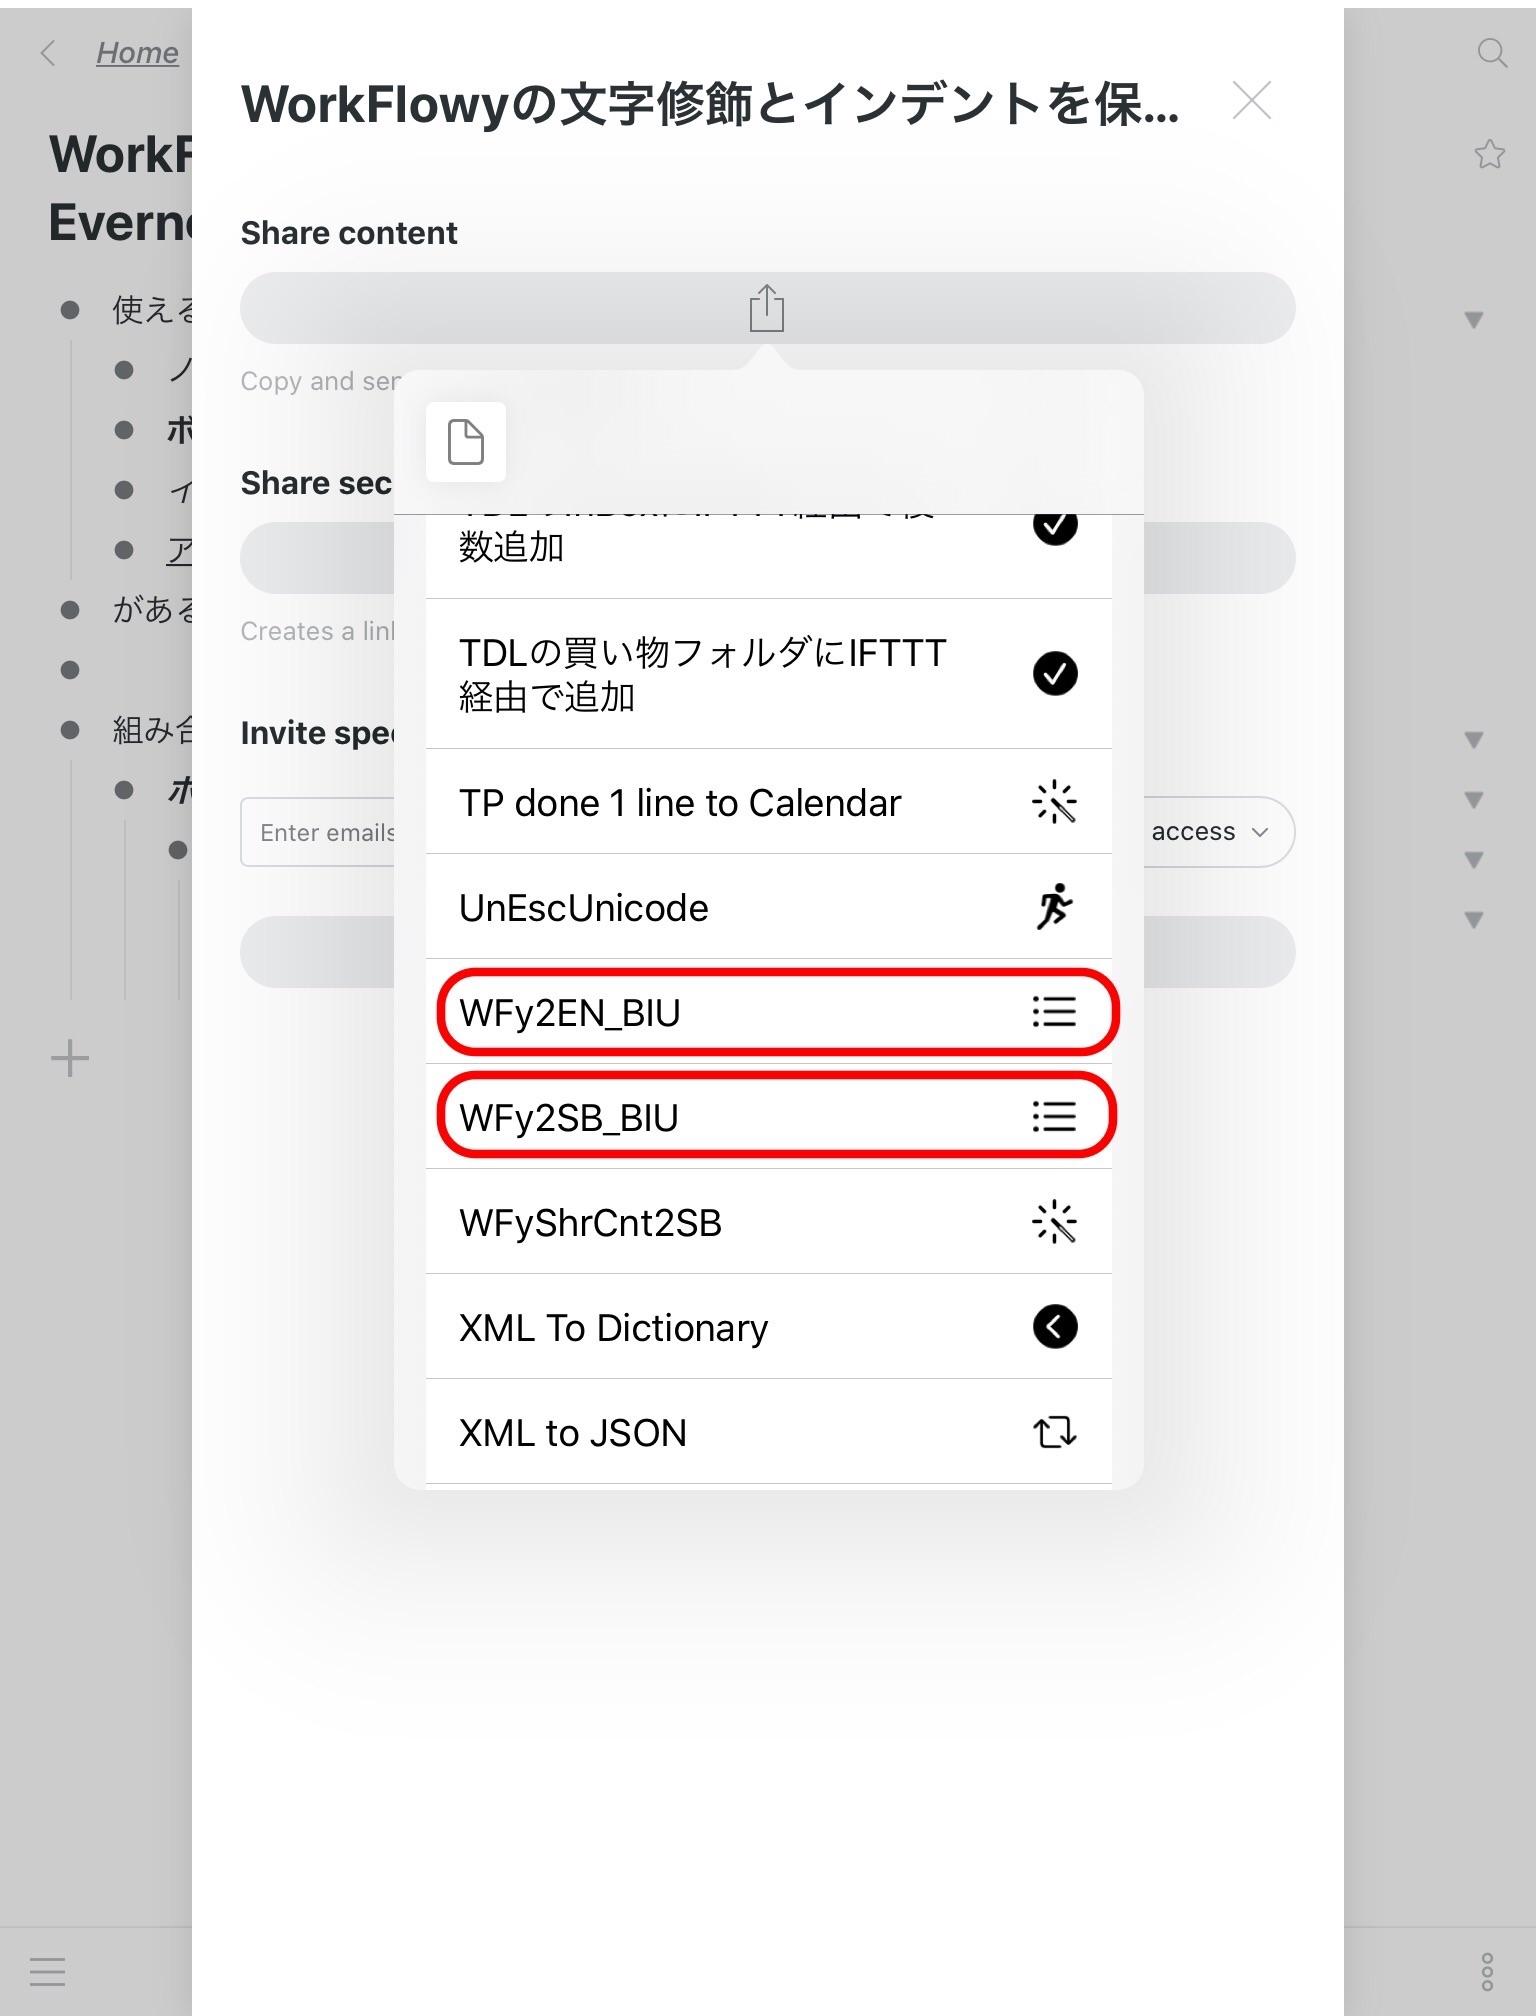 f:id:sorashima:20200731233124j:plain:w637